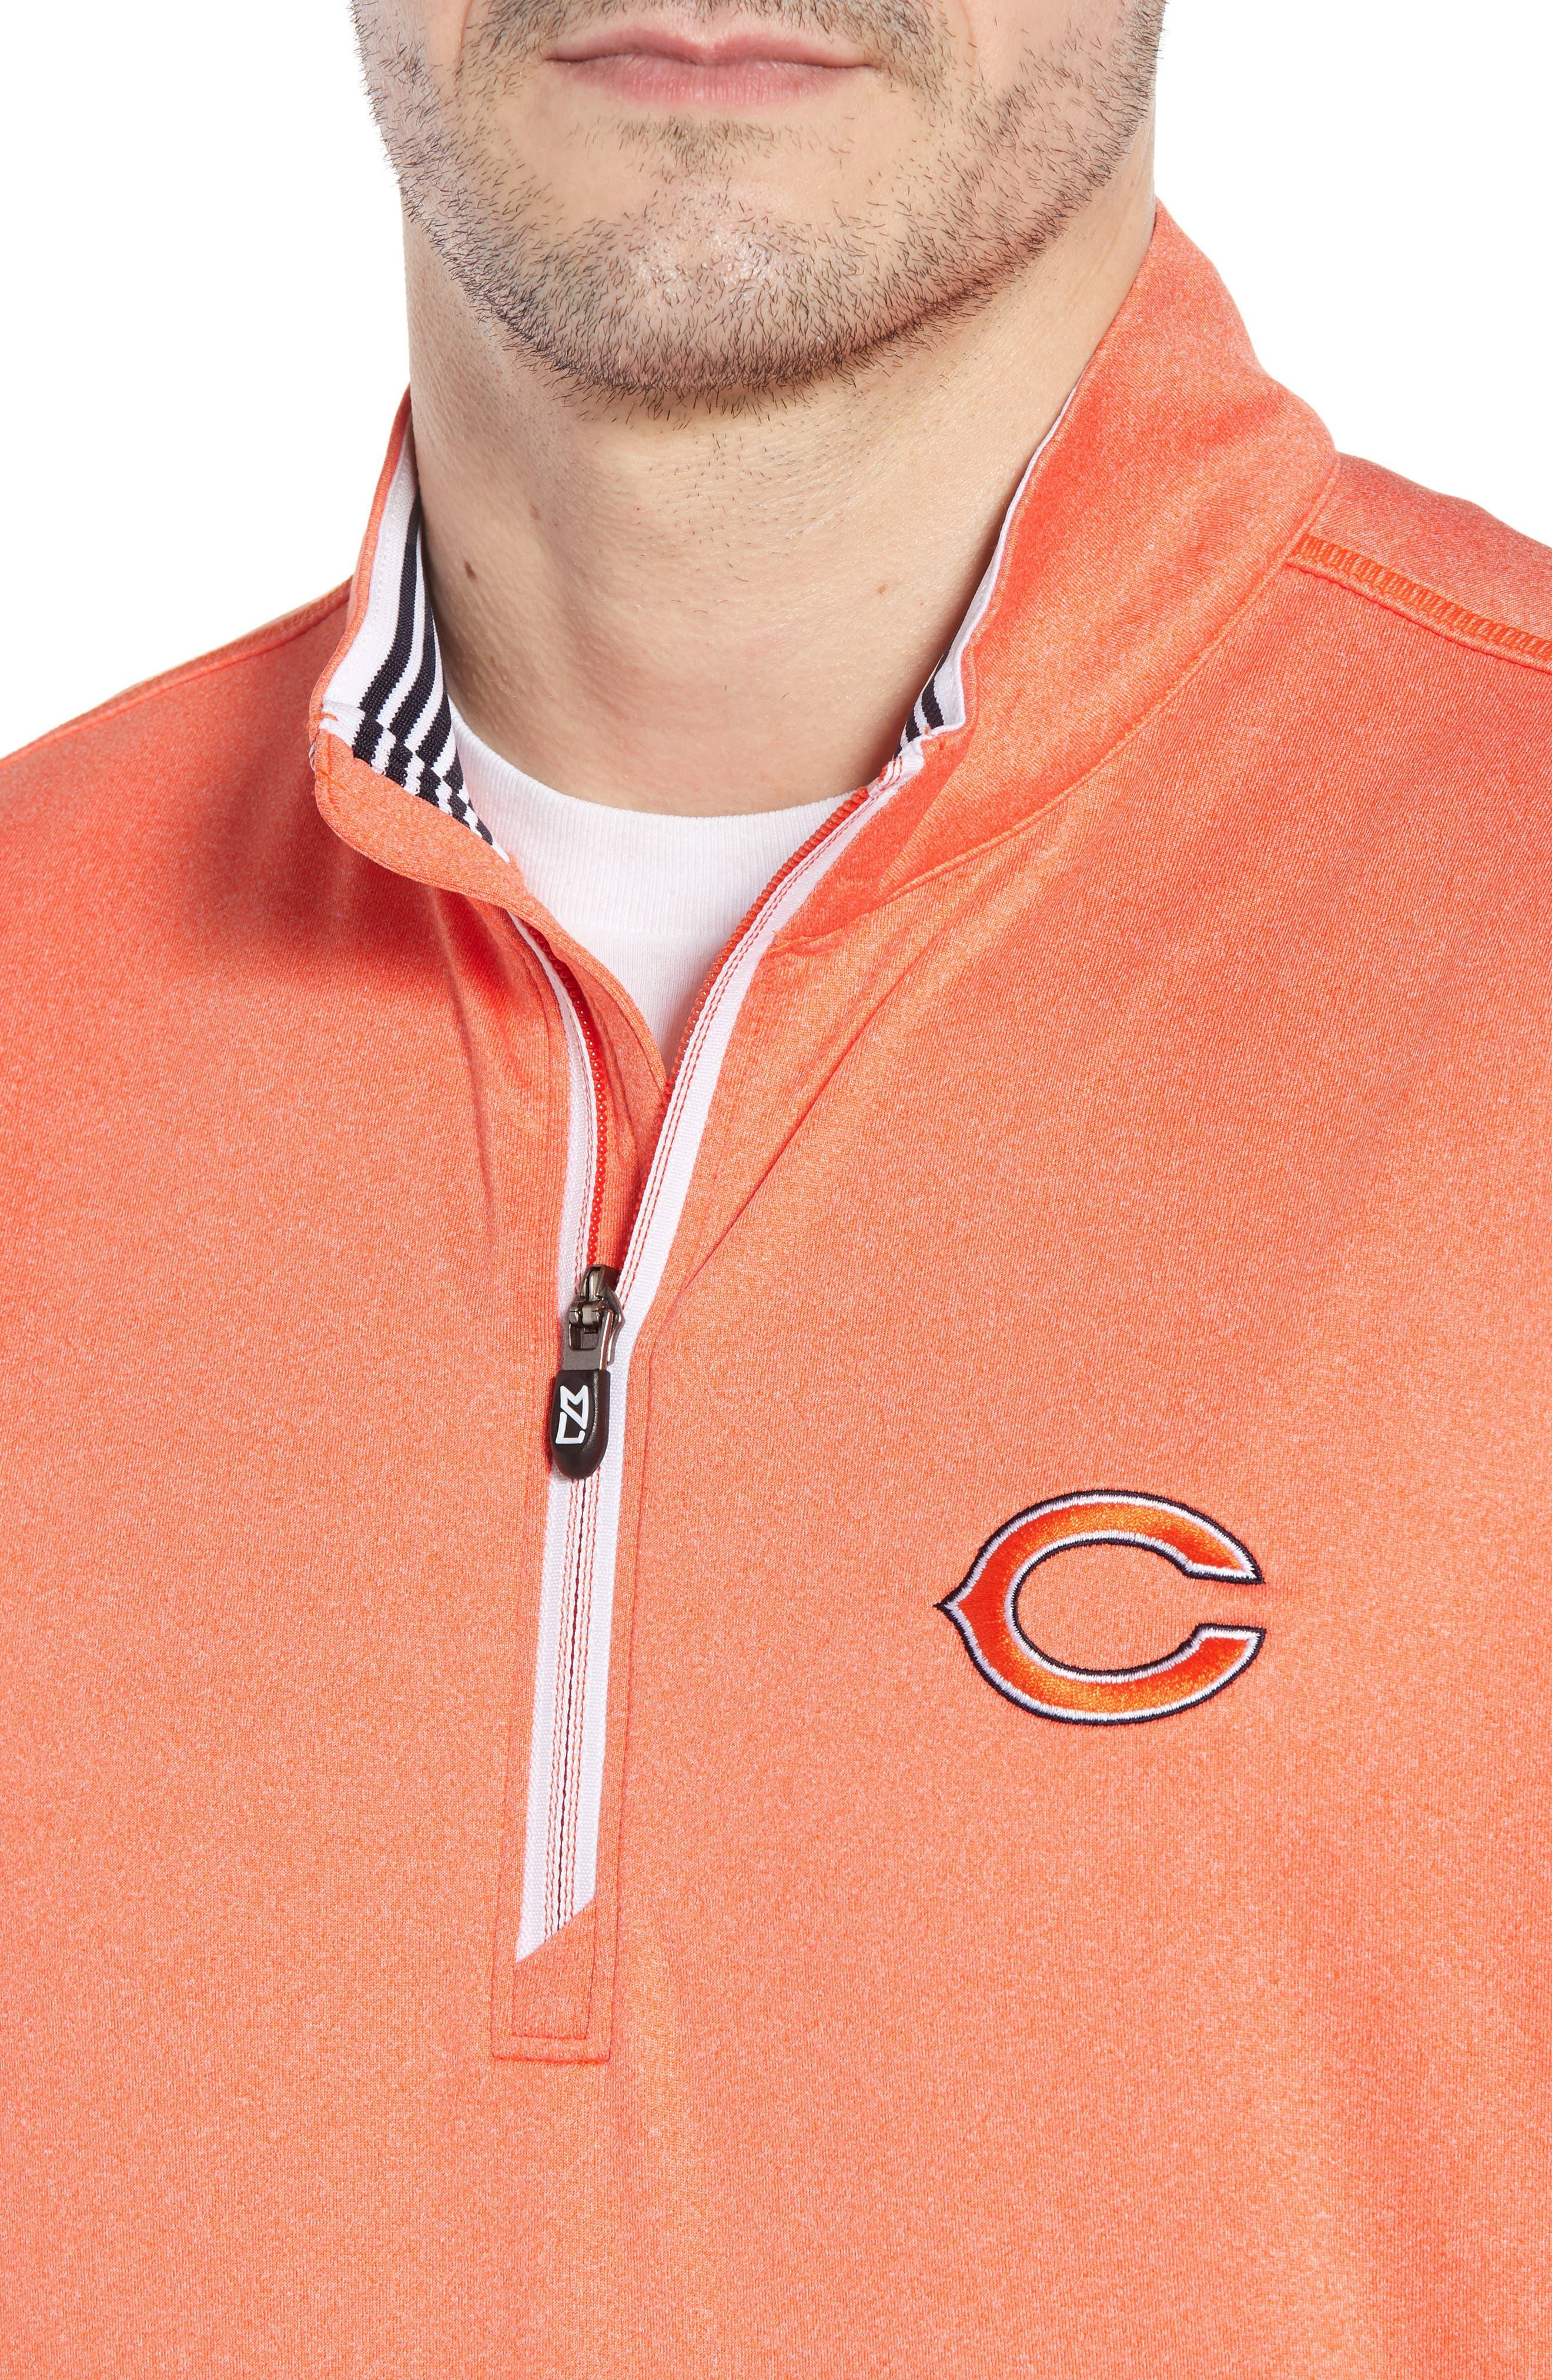 Endurance Chicago Bears Regular Fit Pullover,                             Alternate thumbnail 4, color,                             COLLEGE ORANGE HEATHER